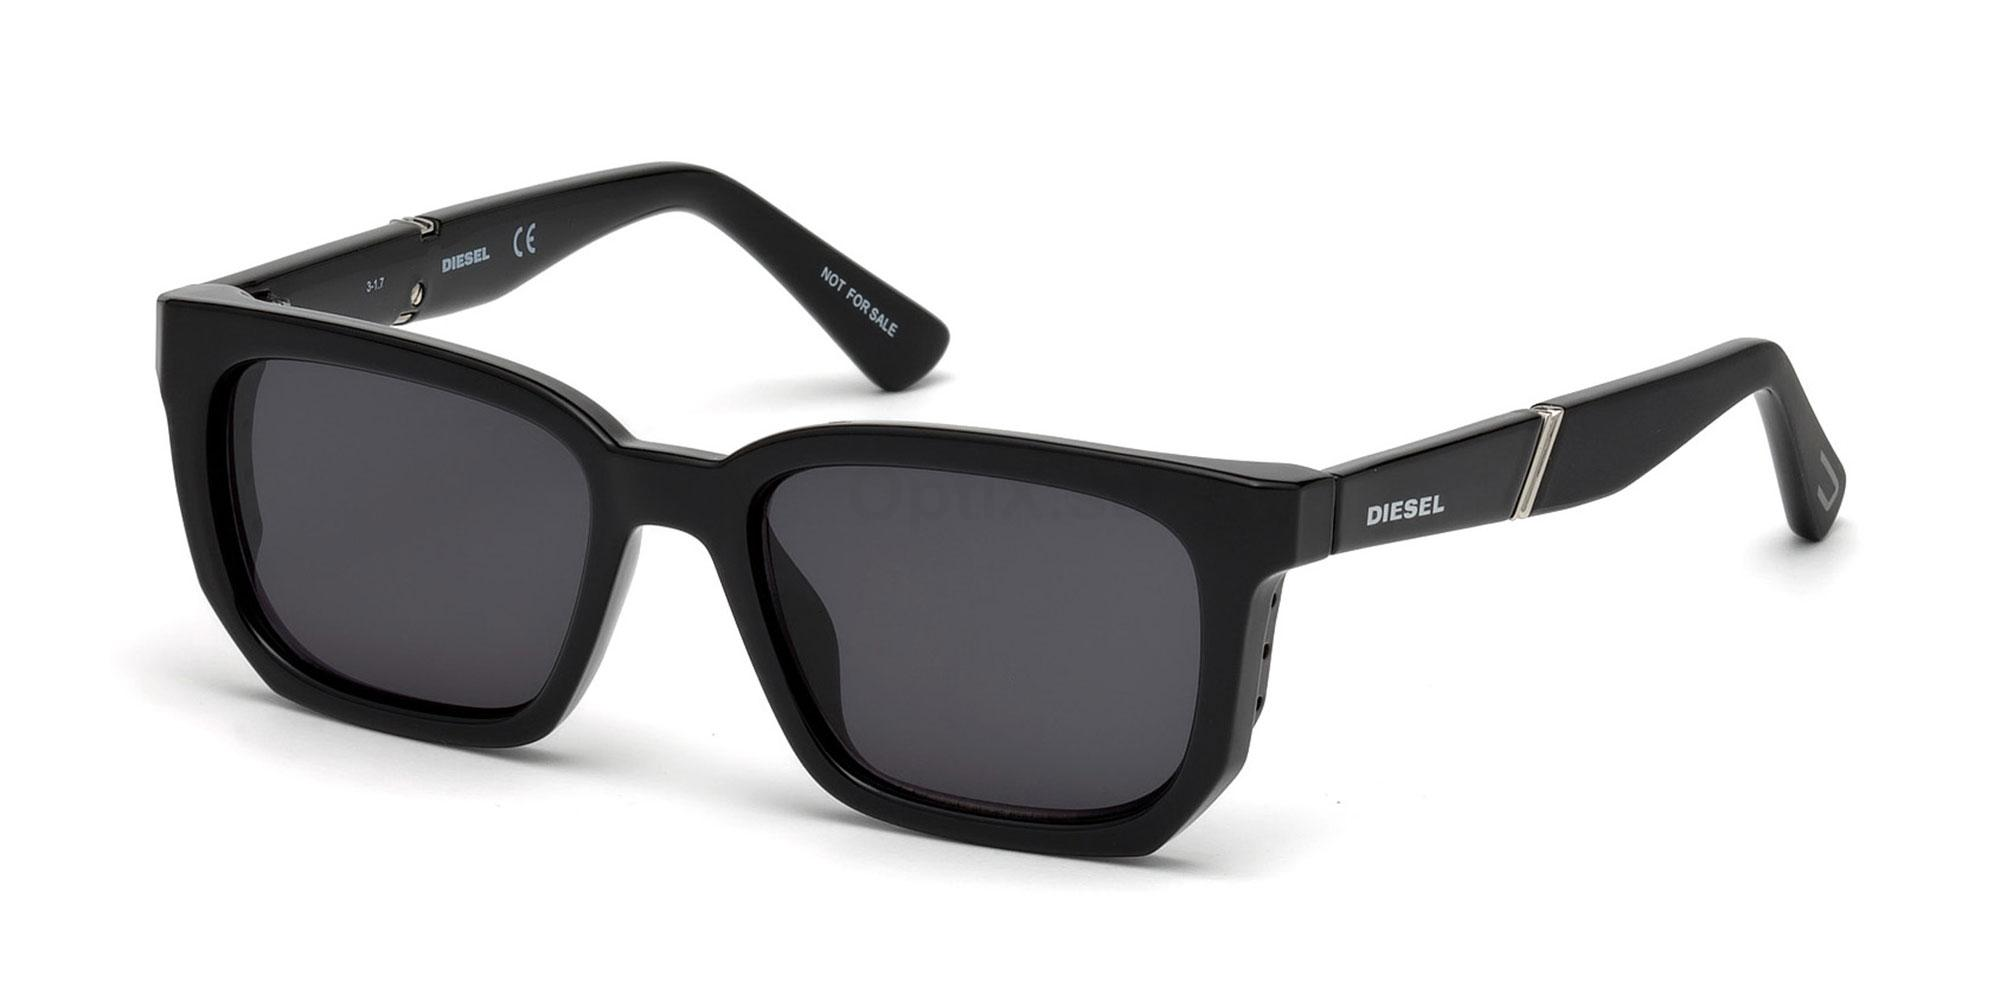 01A DL0257 Sunglasses, Diesel